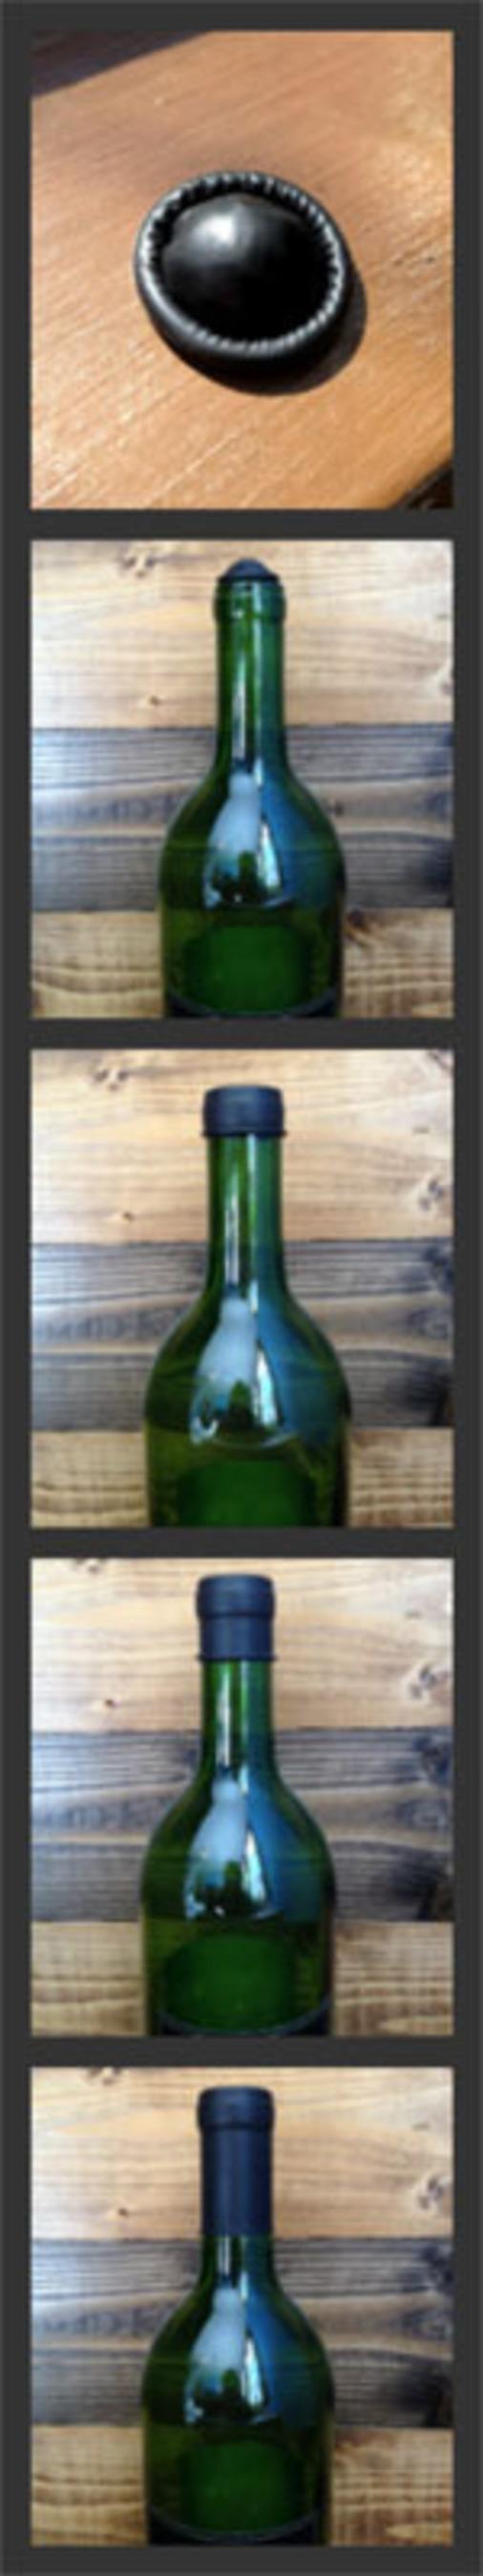 Wine Condom Demonstrated.  (PRNewsFoto/WINE CONDOM)